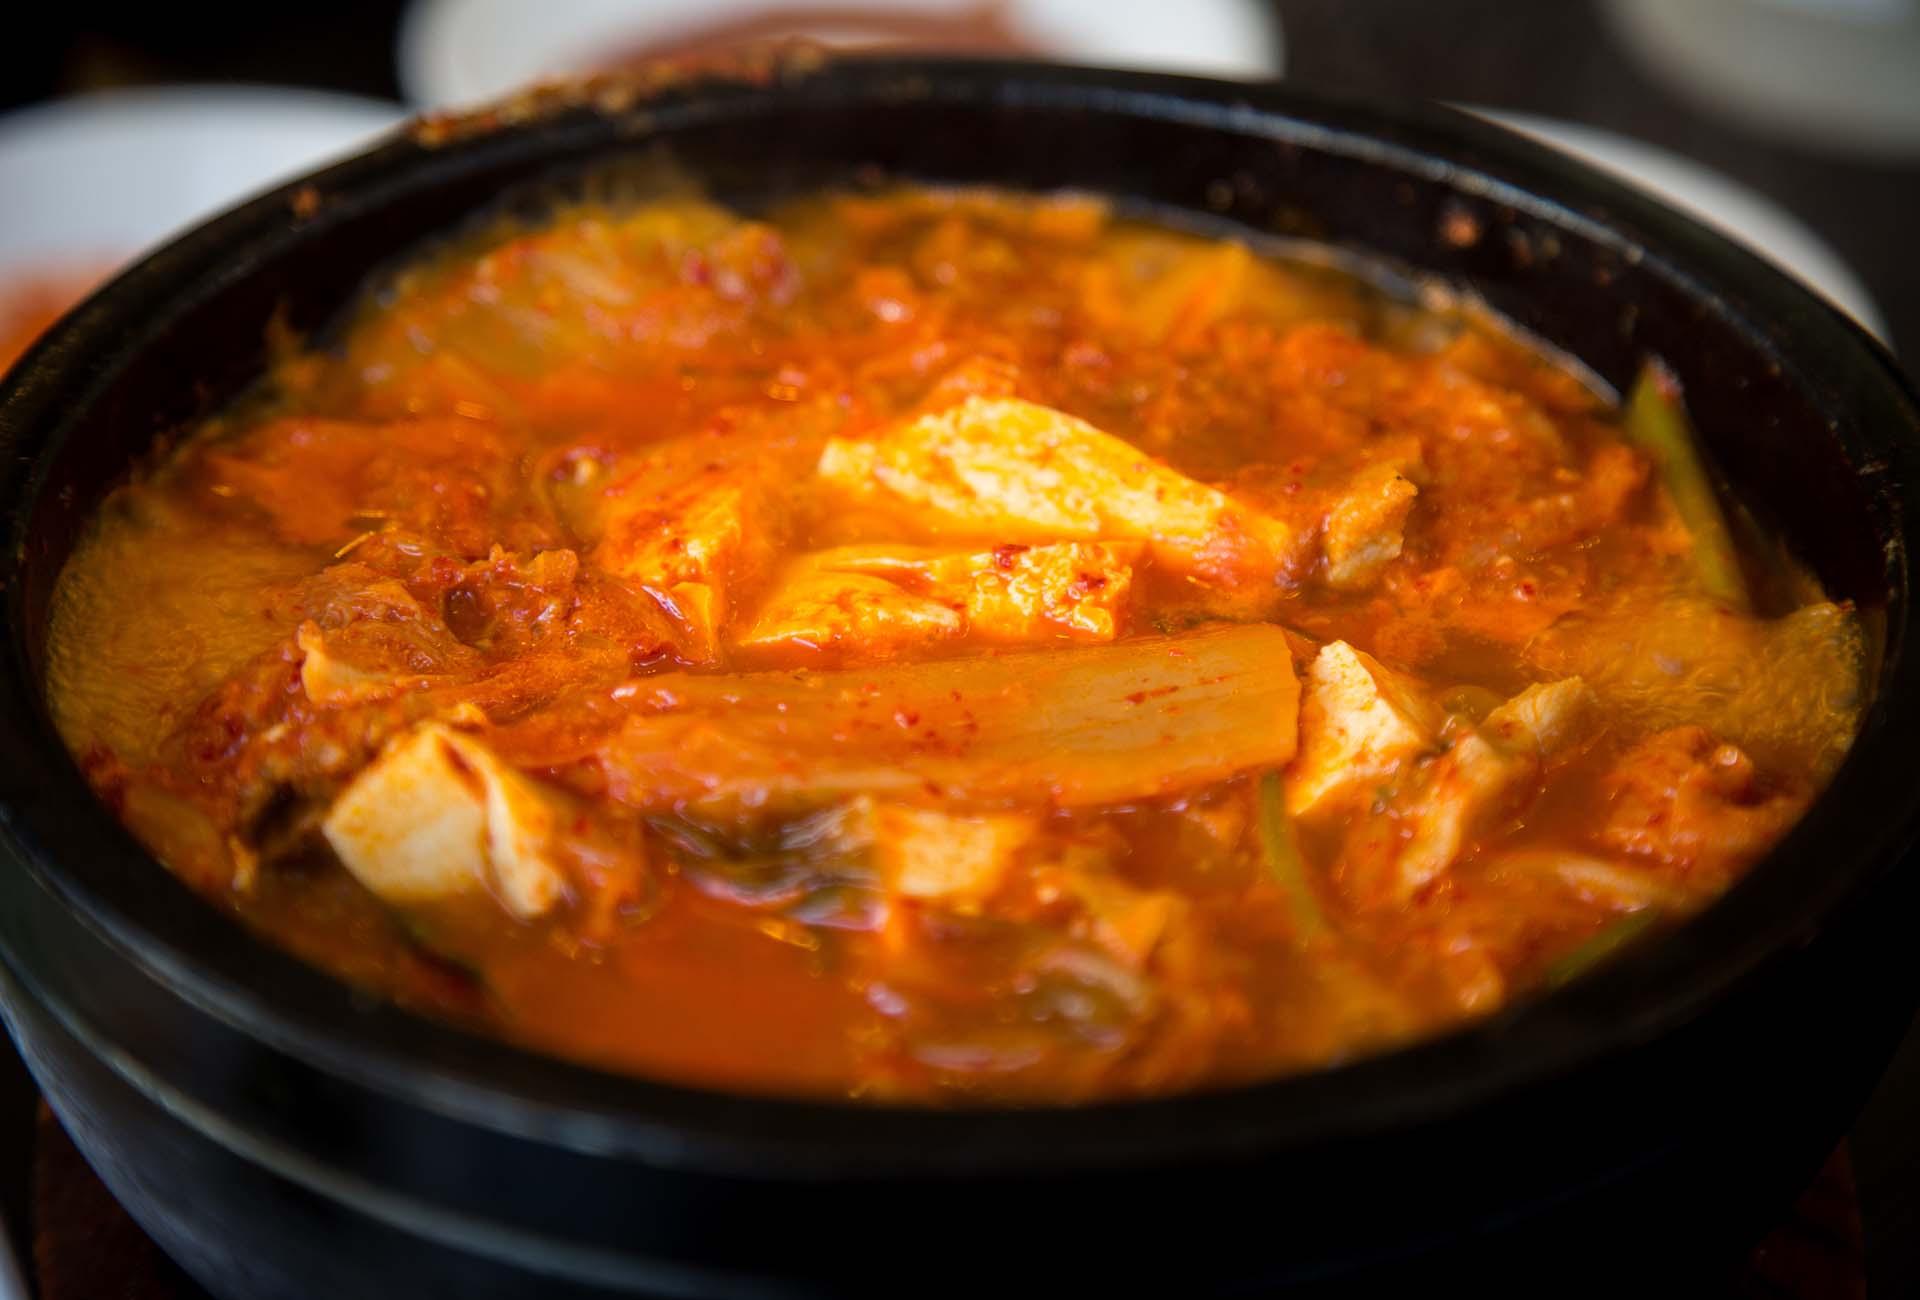 Muguboka offers other traditional Korean staples like kimchi jjigae